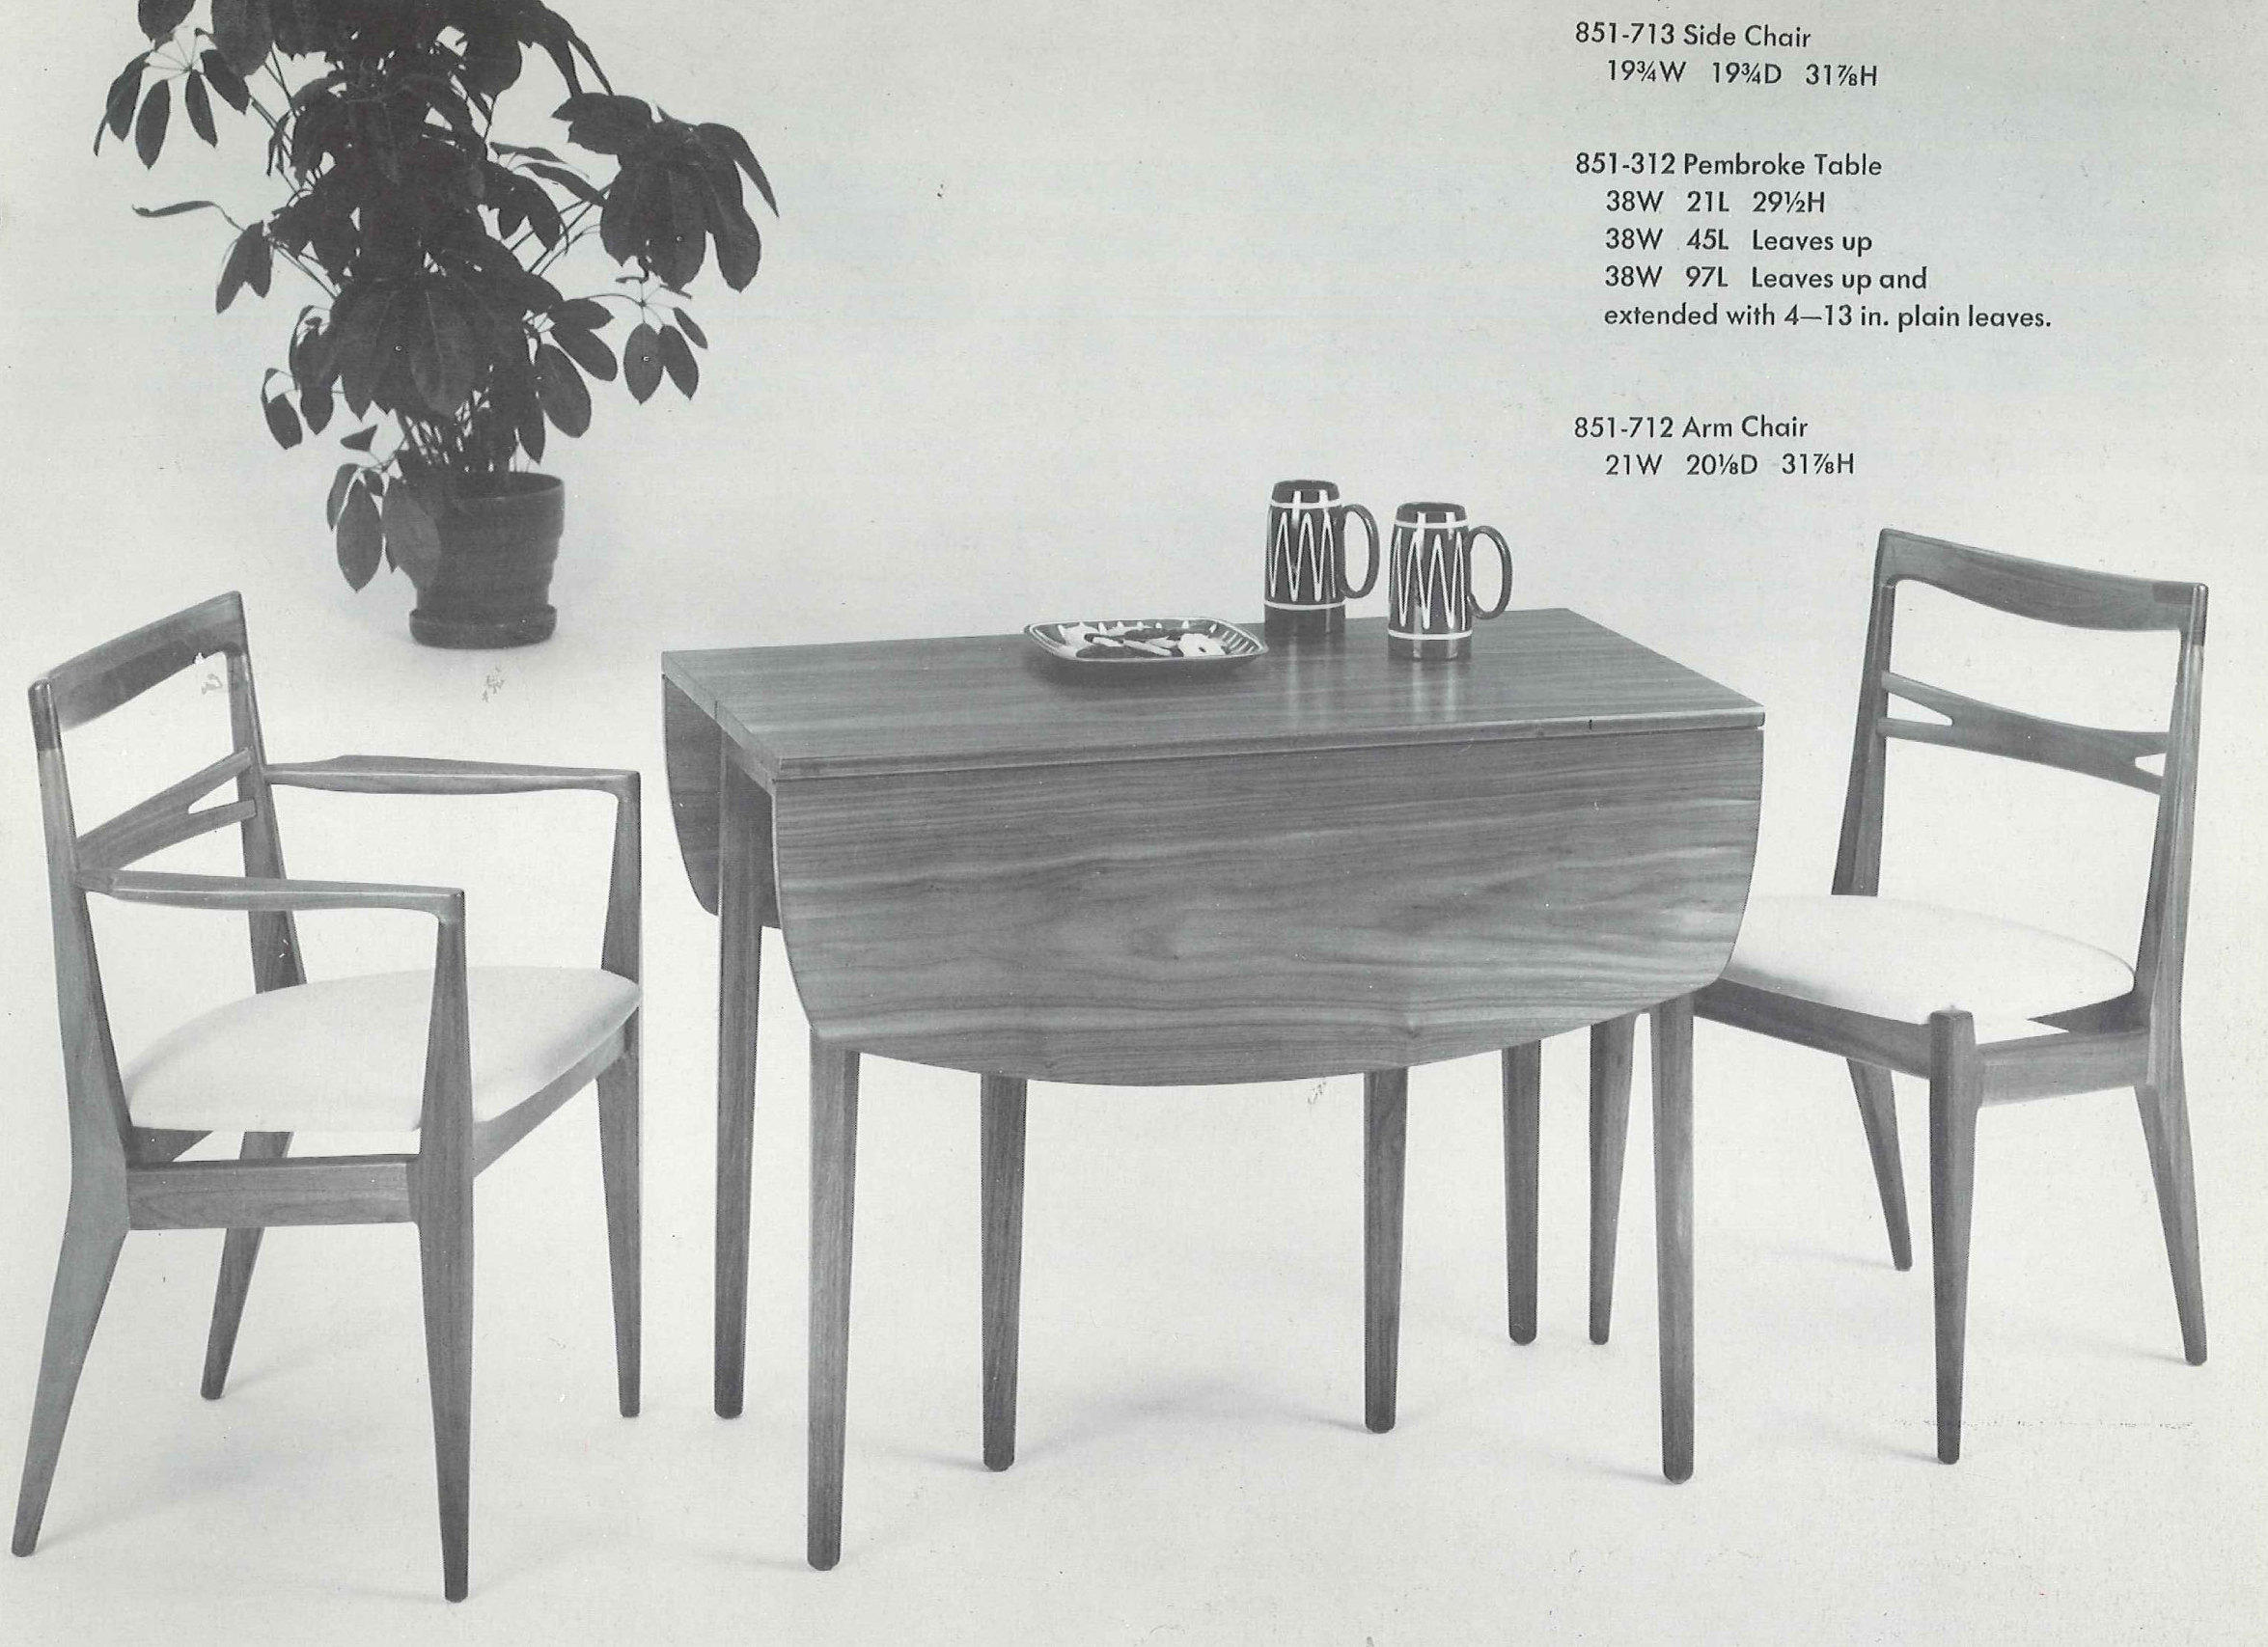 Swell Midcentury Furniture Grandkid Nostalgia Modern Trend Wxpr Dailytribune Chair Design For Home Dailytribuneorg